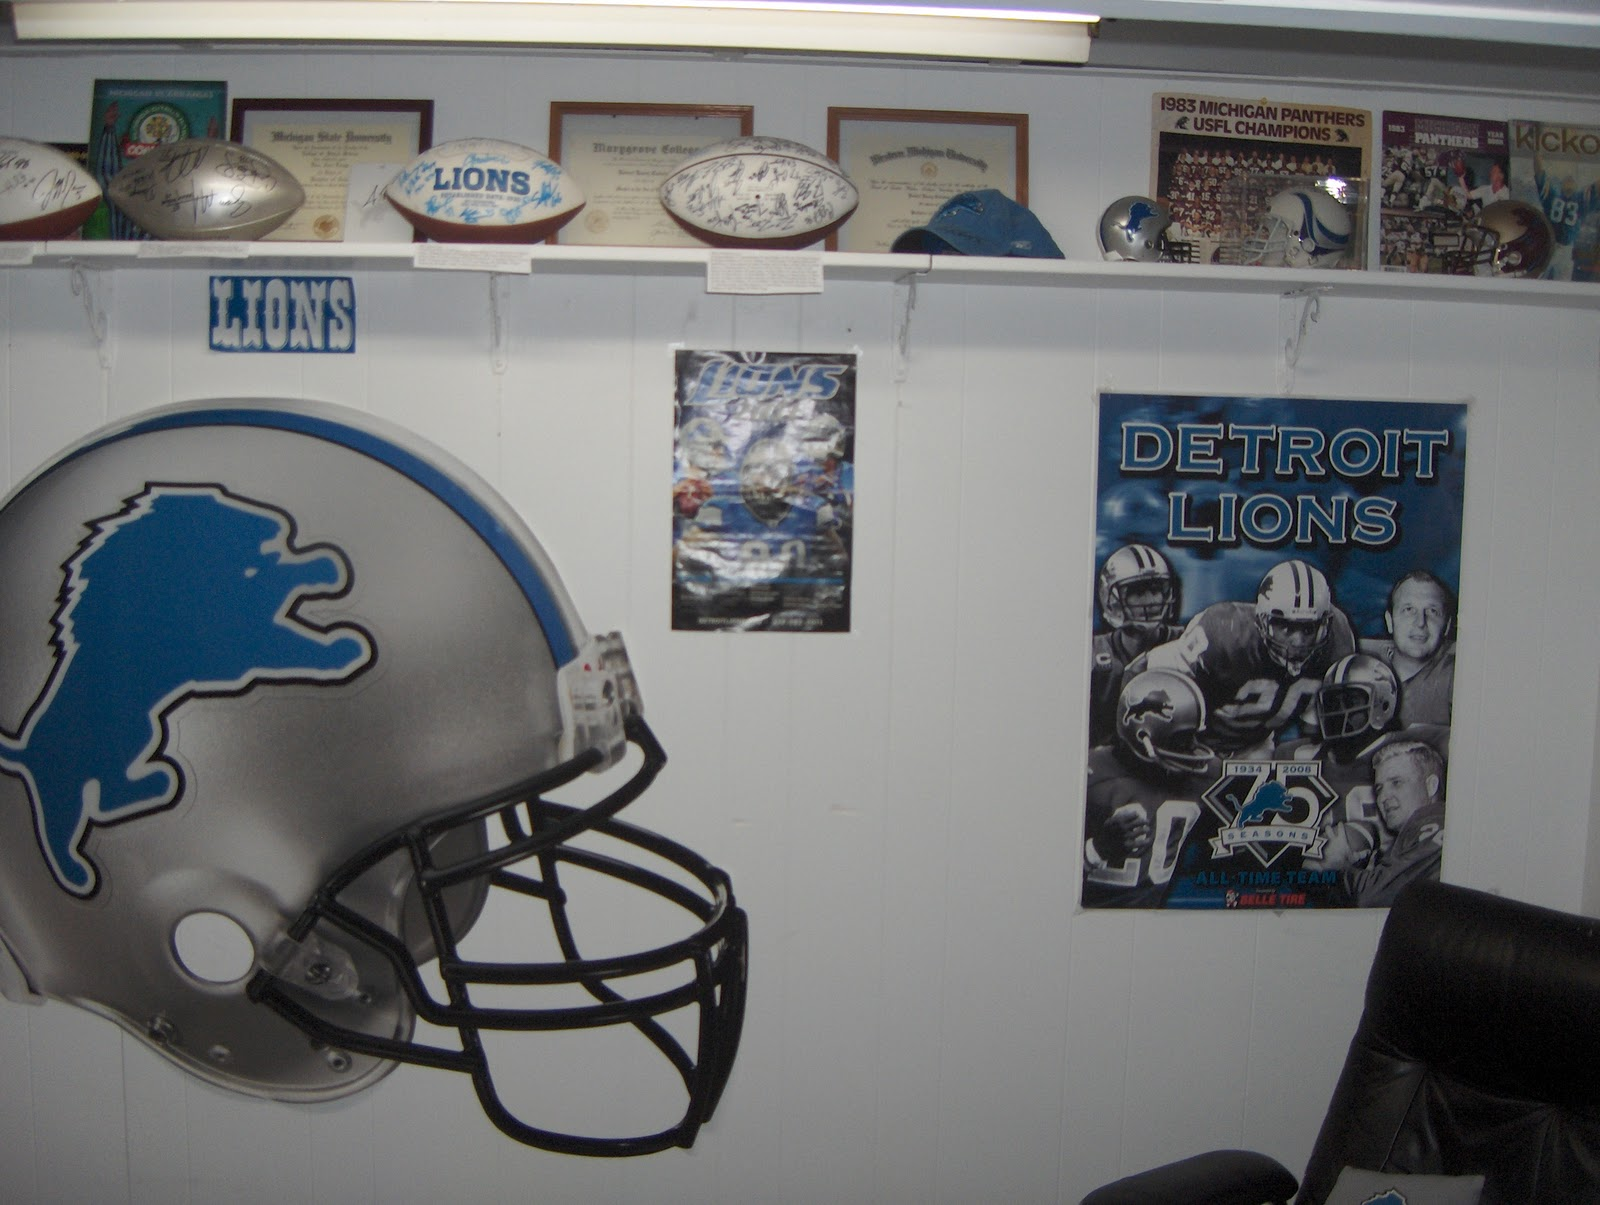 Detroit Lions Man Cave Ideas : Best our new sports room man cave images